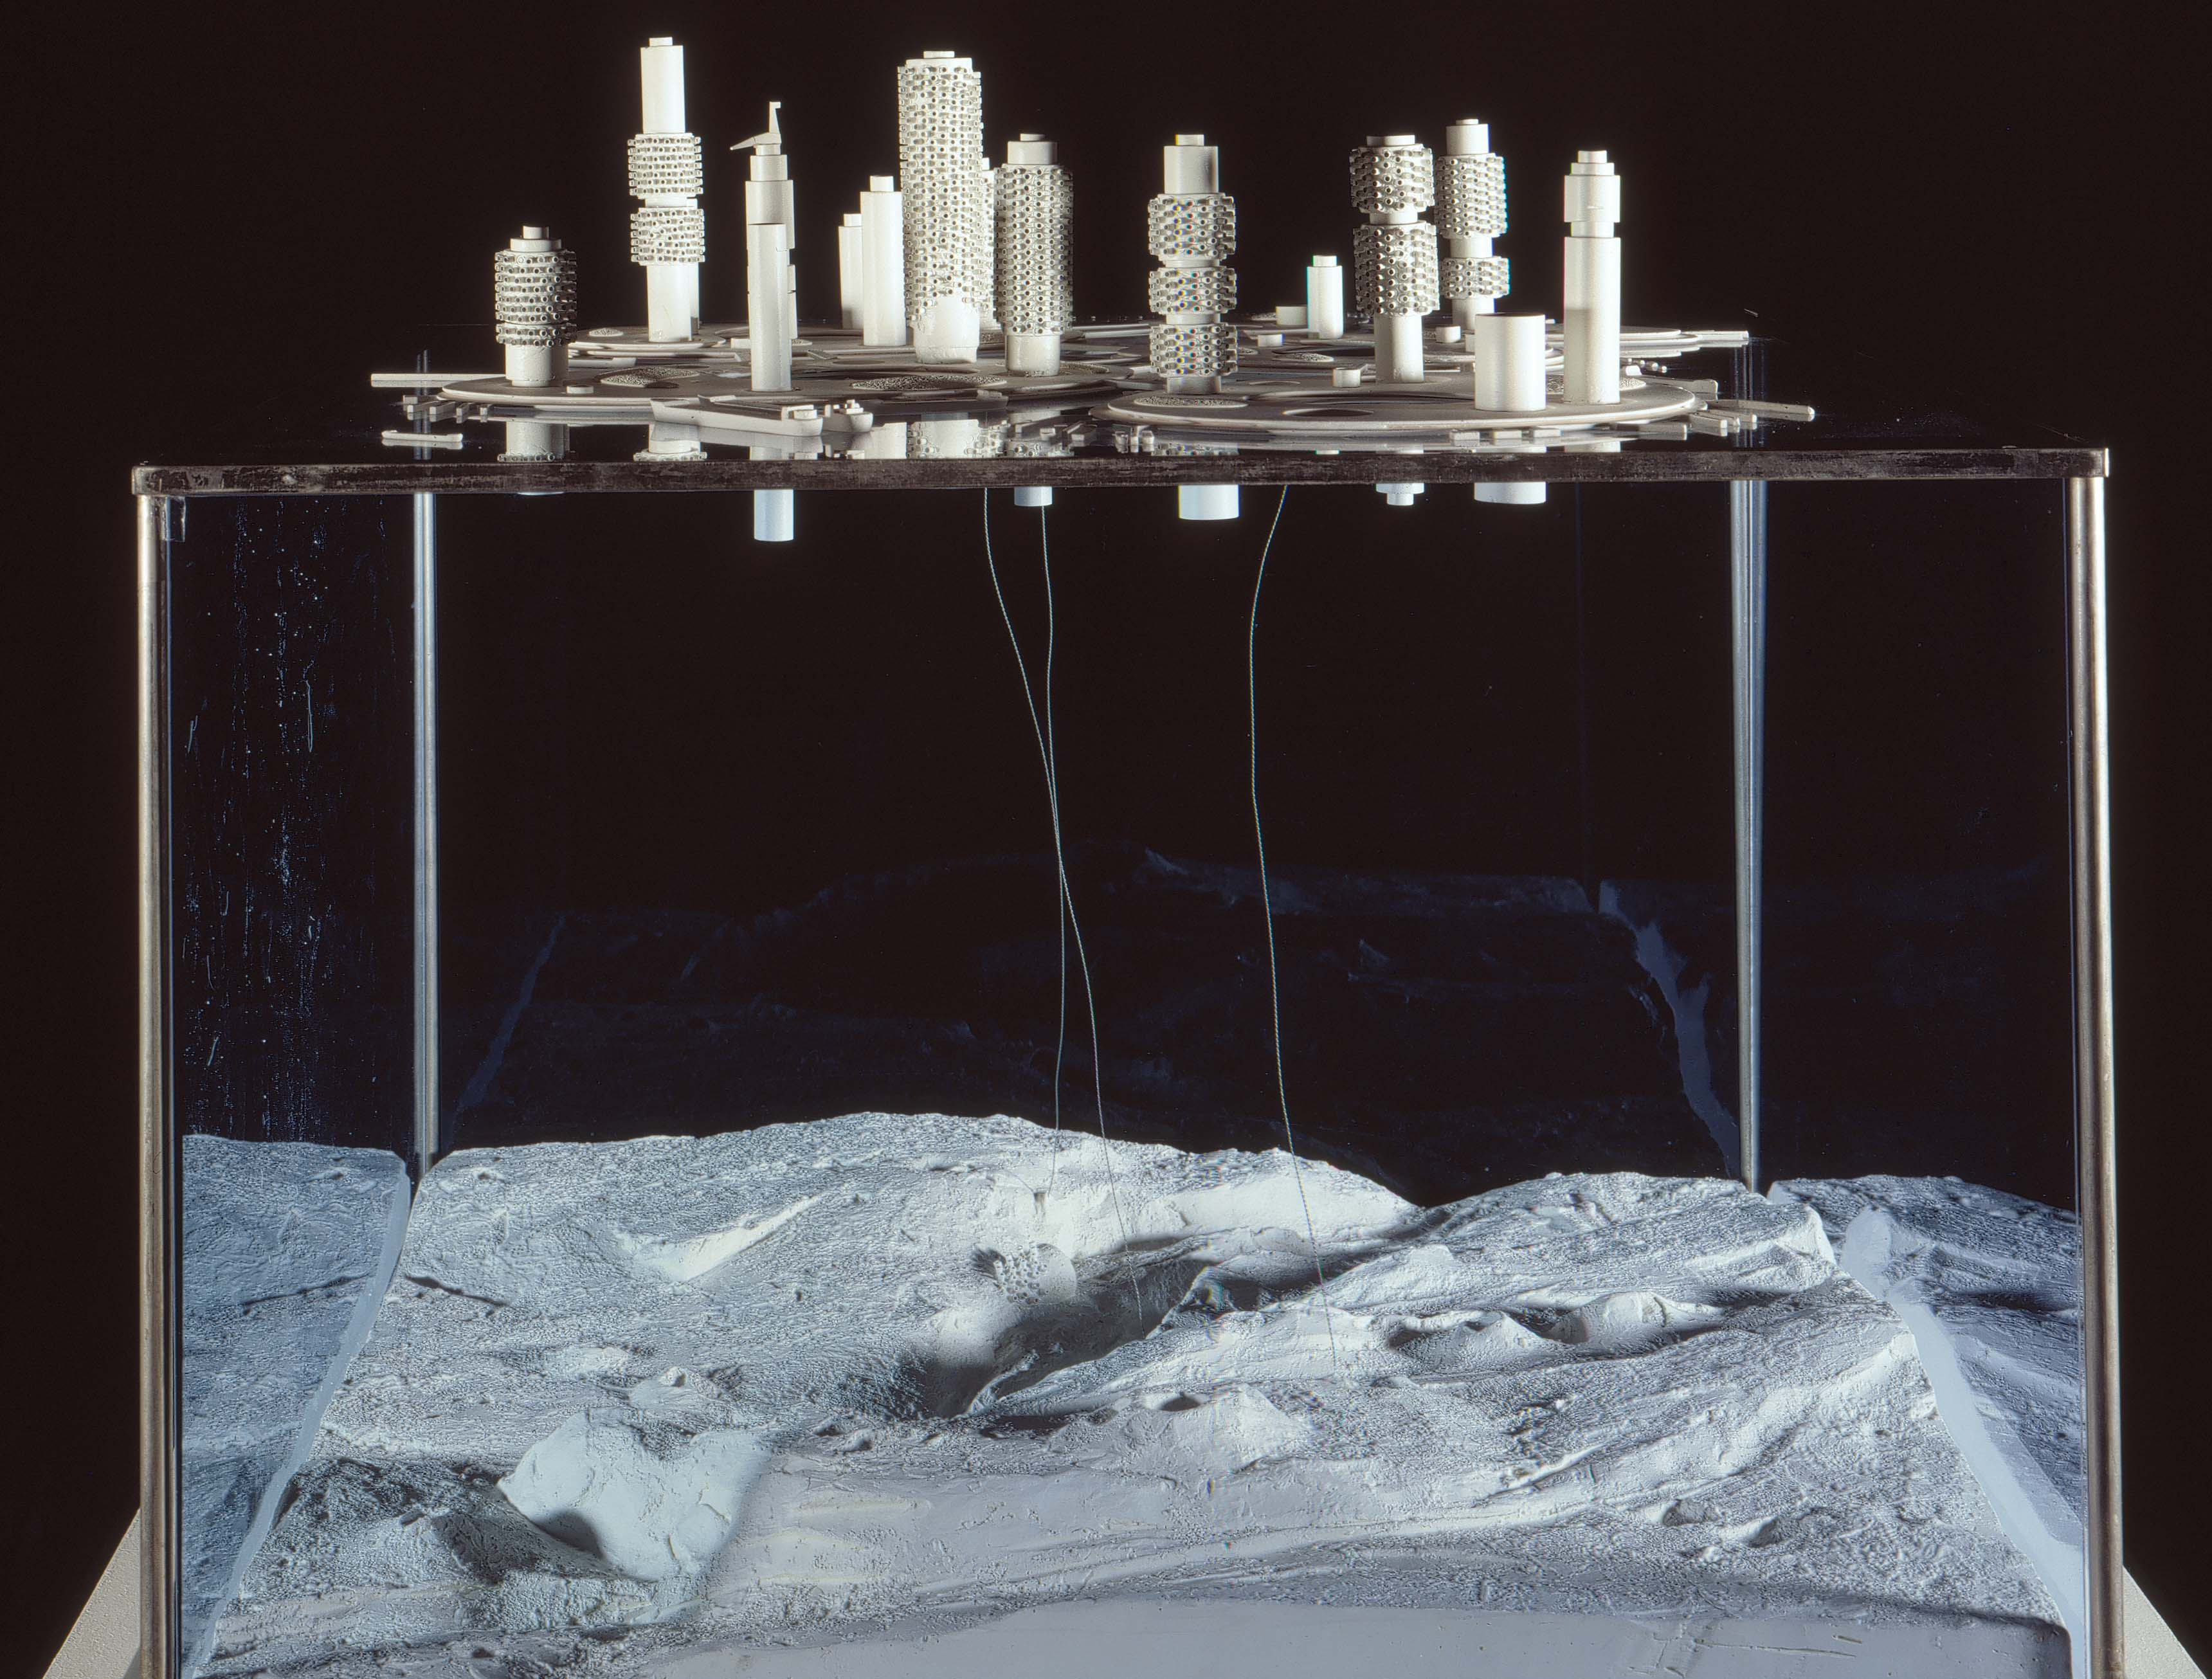 Kiyonori Kikutake, Marine City (Ville sur la mer), projet non réalisé, 1963